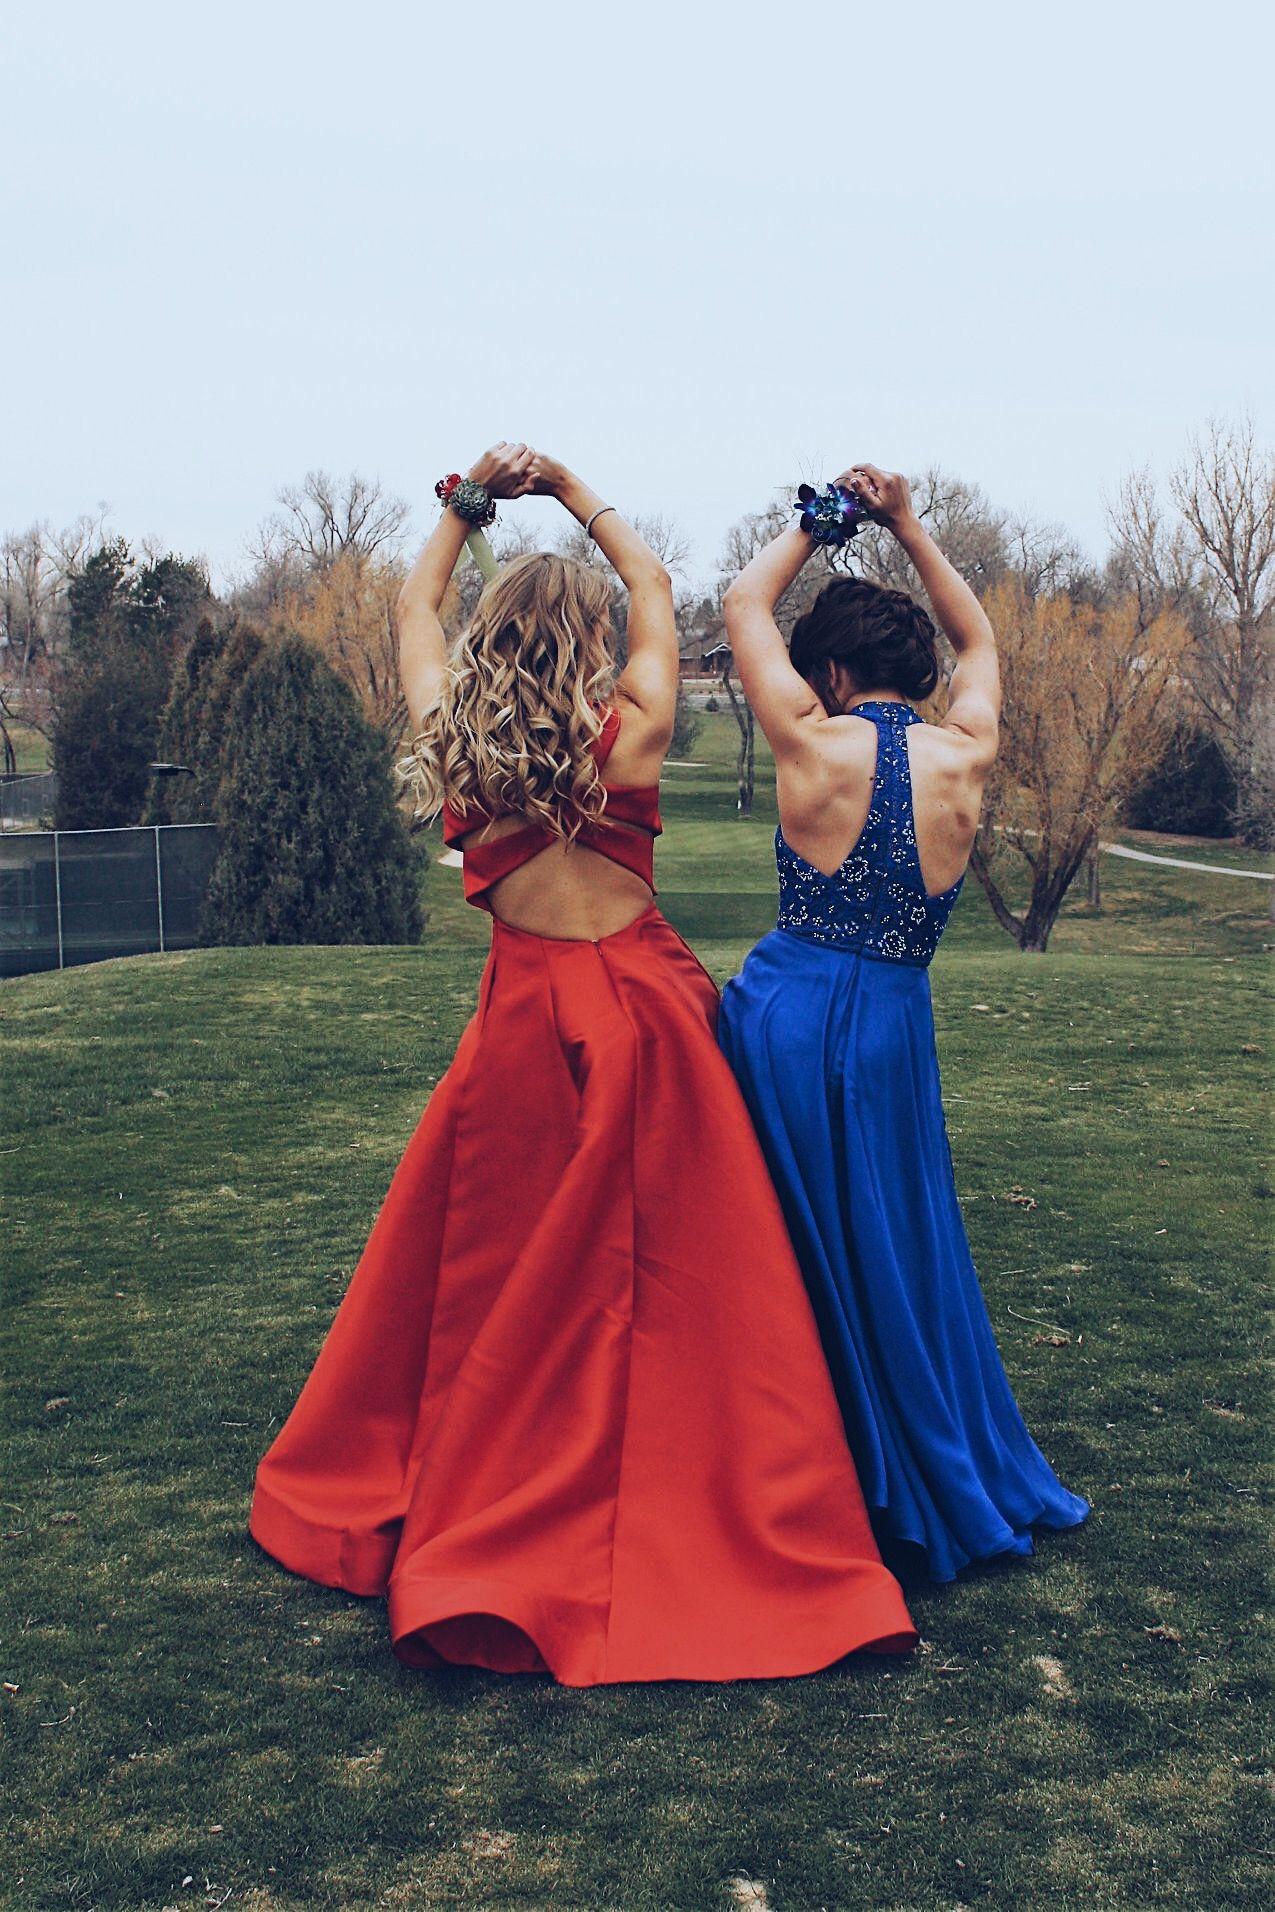 Prom Season Prom Pictures Best Friend Red Dress Blue Dress Blonde